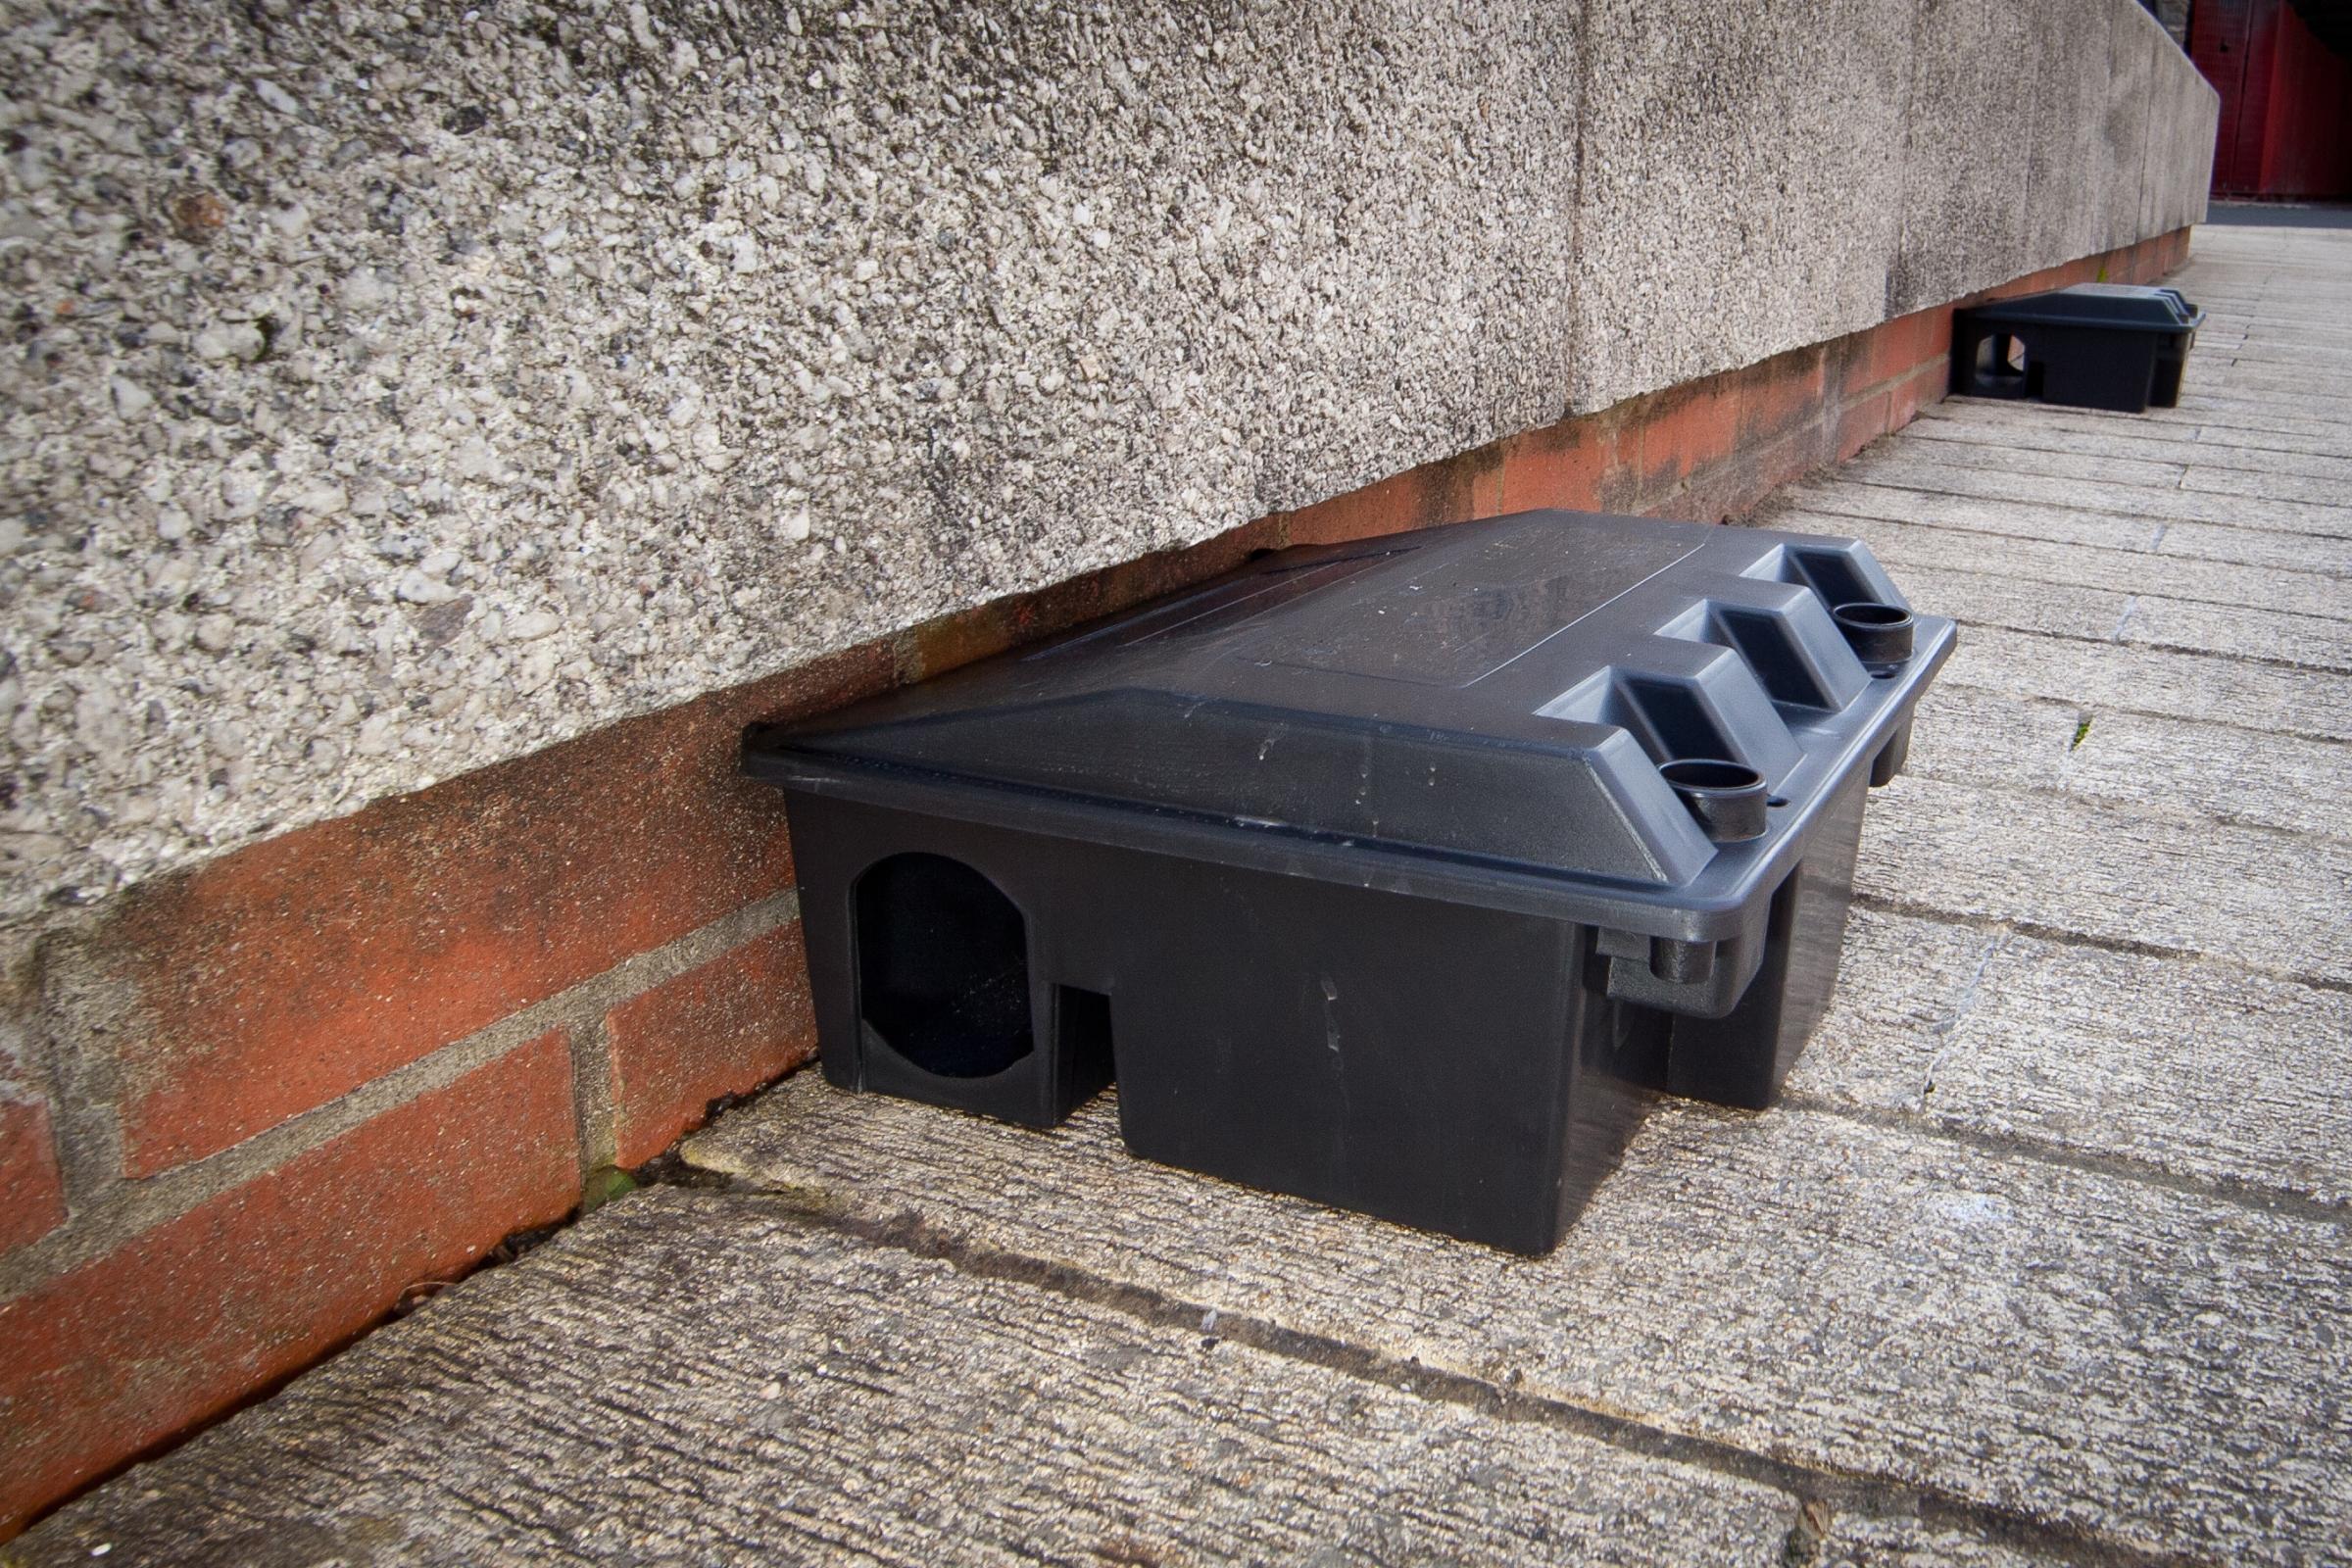 rodent control rat box.JPG